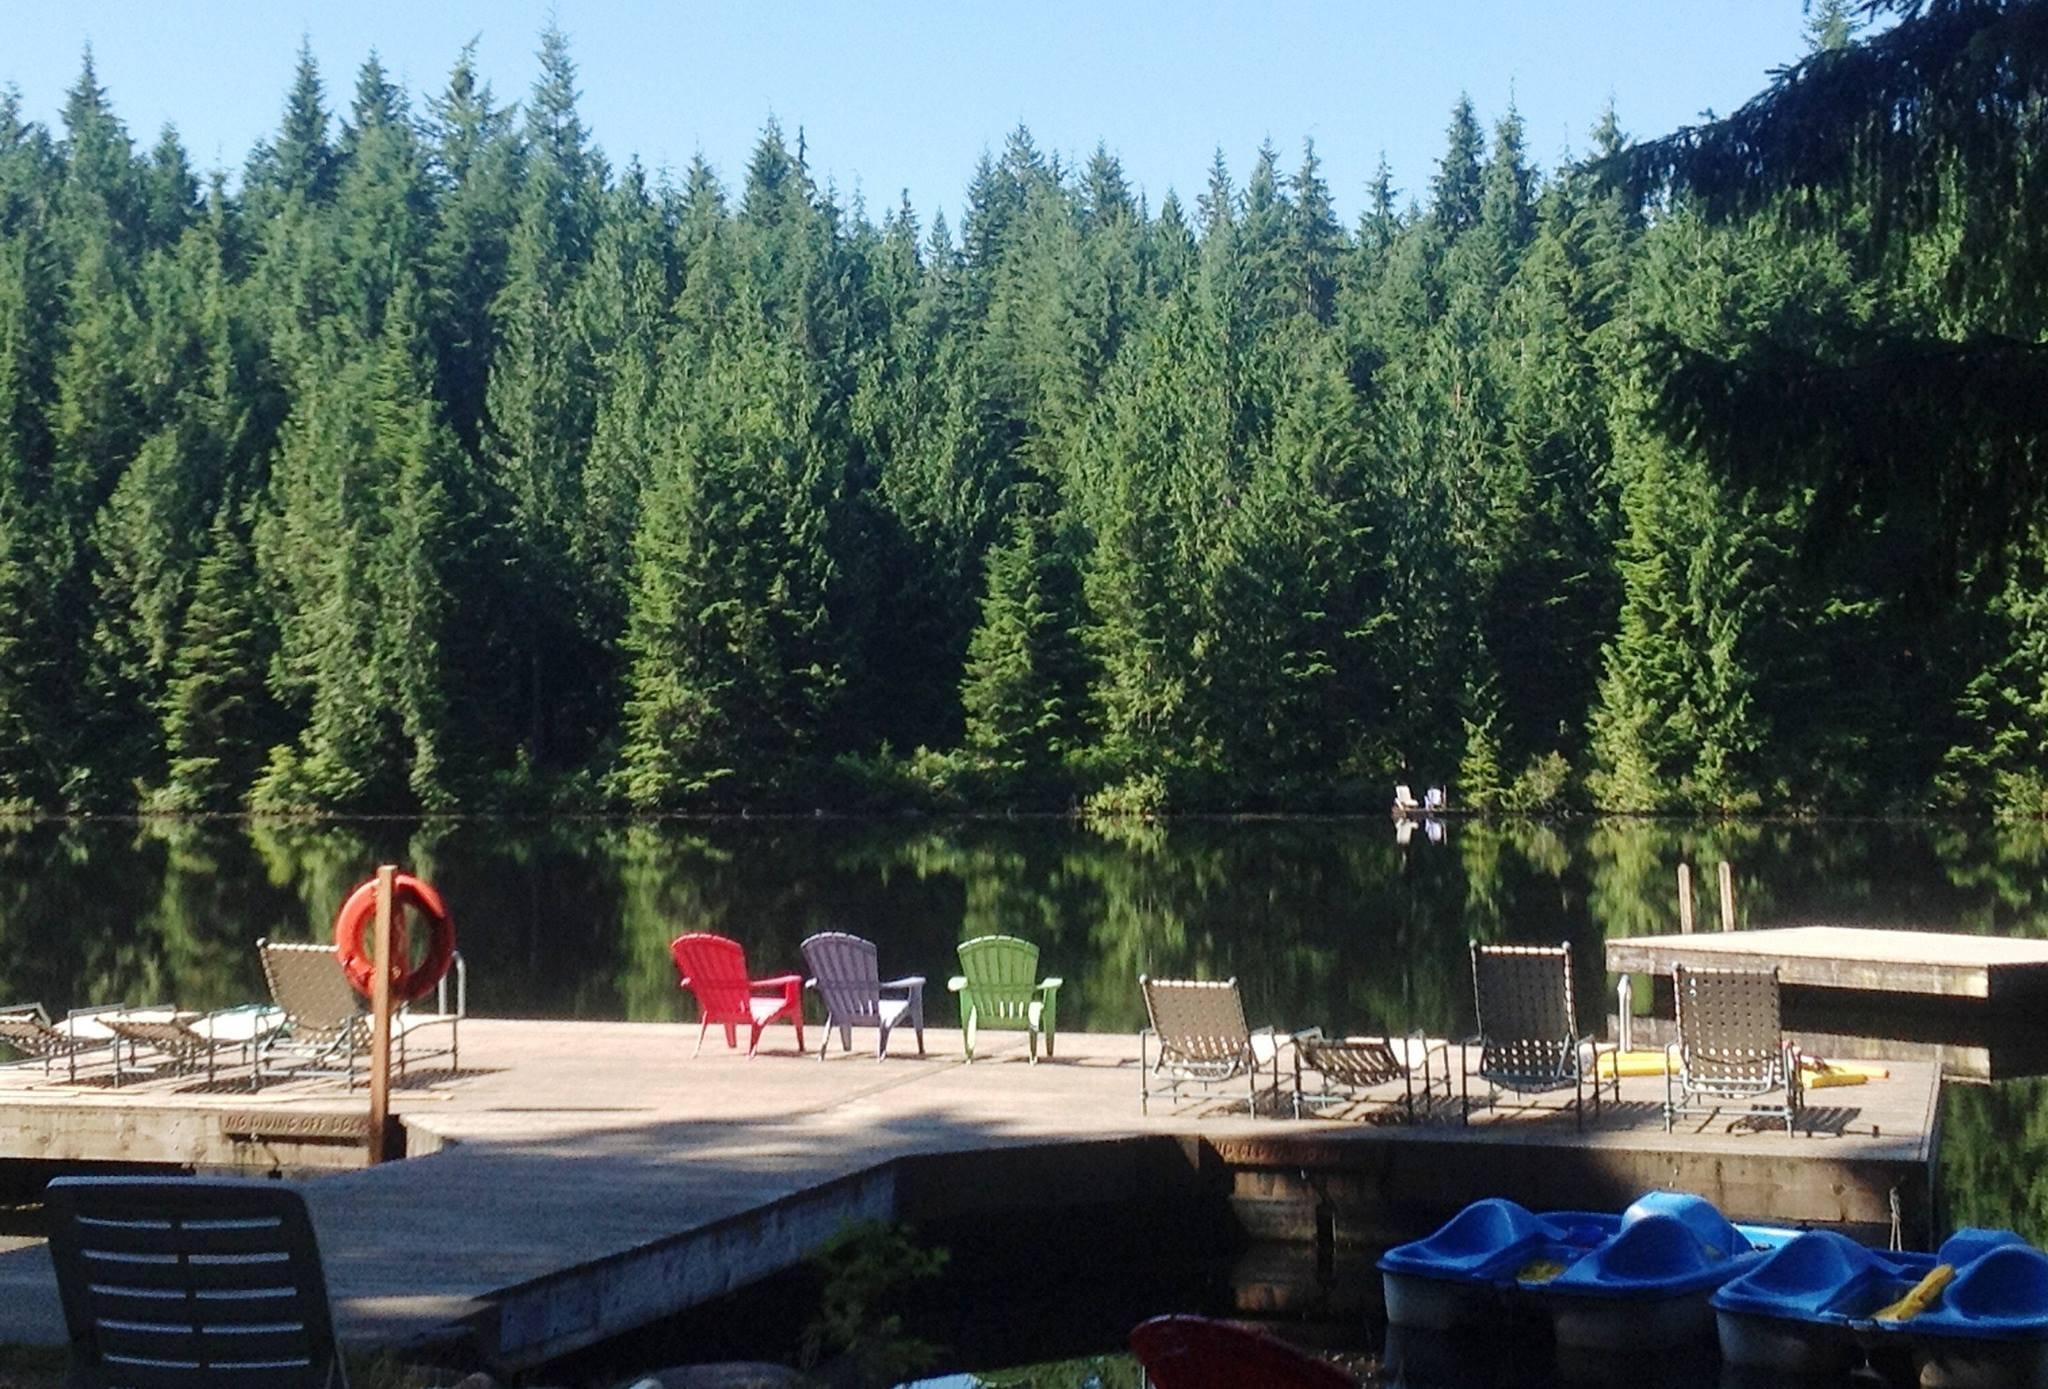 Lake Bronson Club Family Nudist Park - Sultan, WA - RV